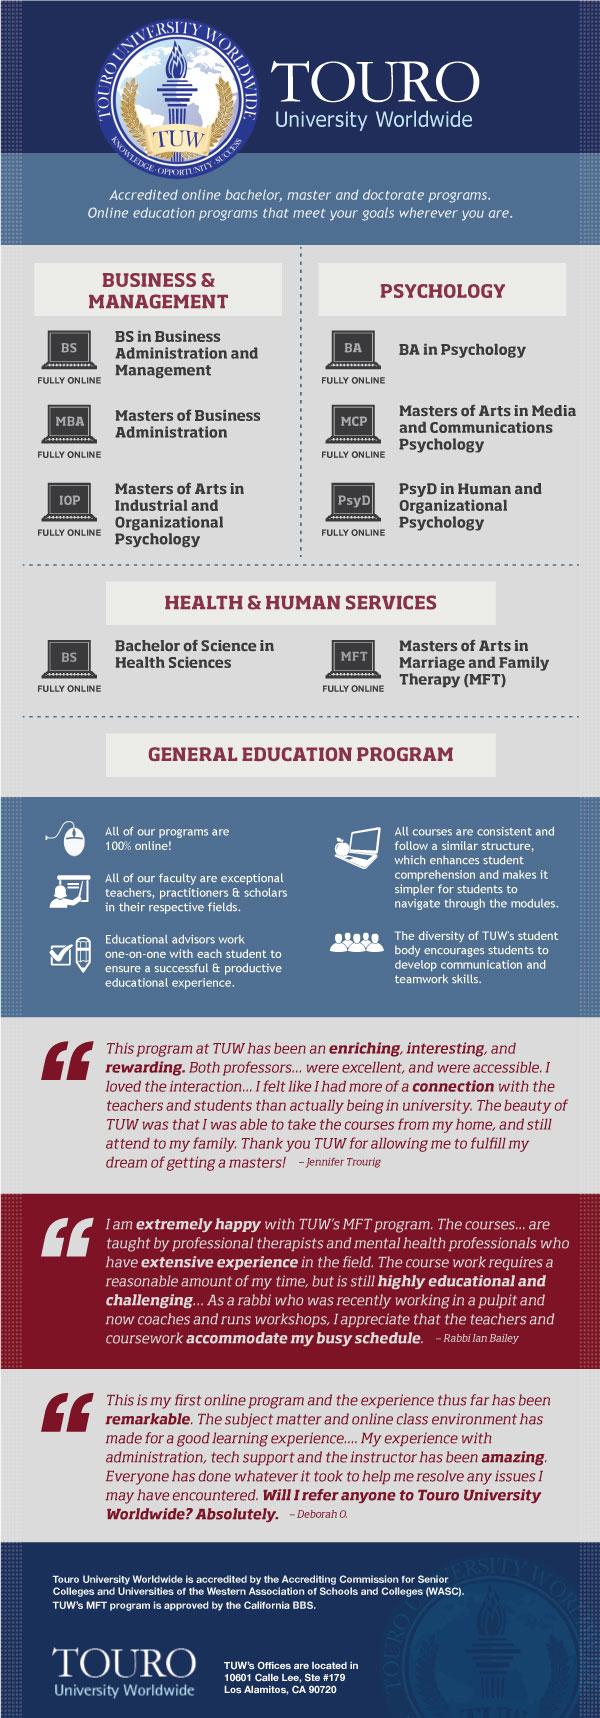 TUW infographic - Touro University Worldwide online courses